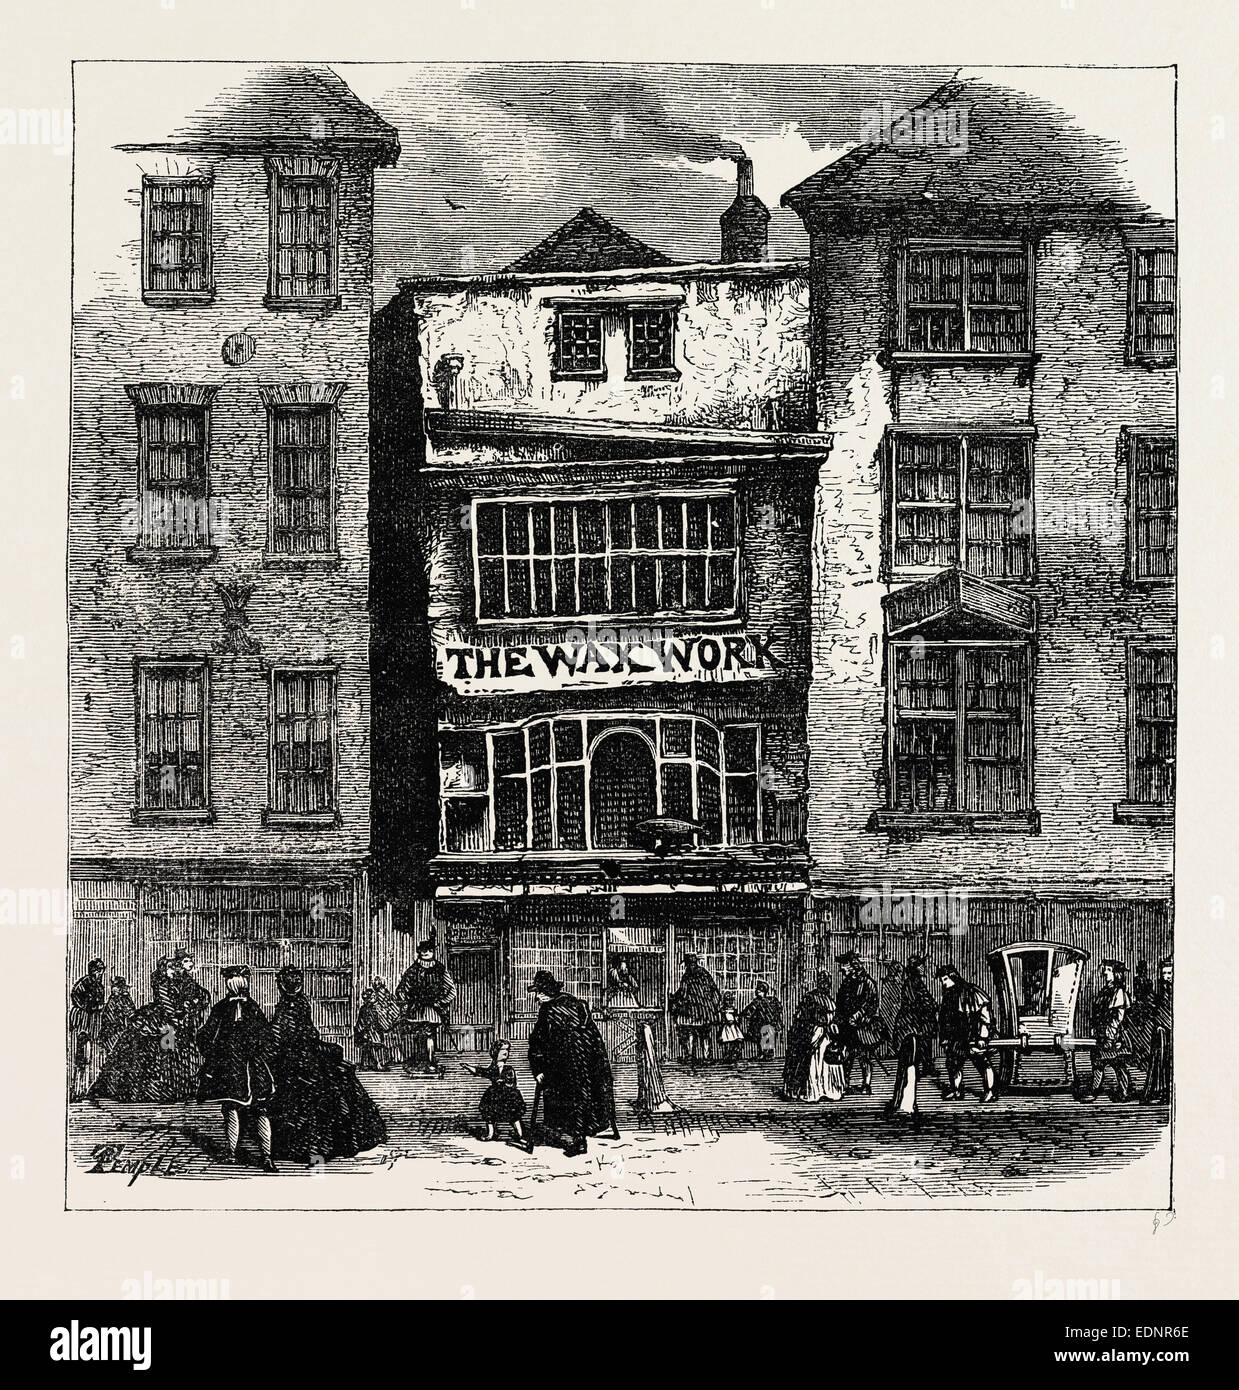 MRS. SALMON'S WAXWORK, FLEET STREET, PALACE OF HENRY VIII. AND CARDINAL WOLSEY. London, UK, 19th century engraving - Stock Image